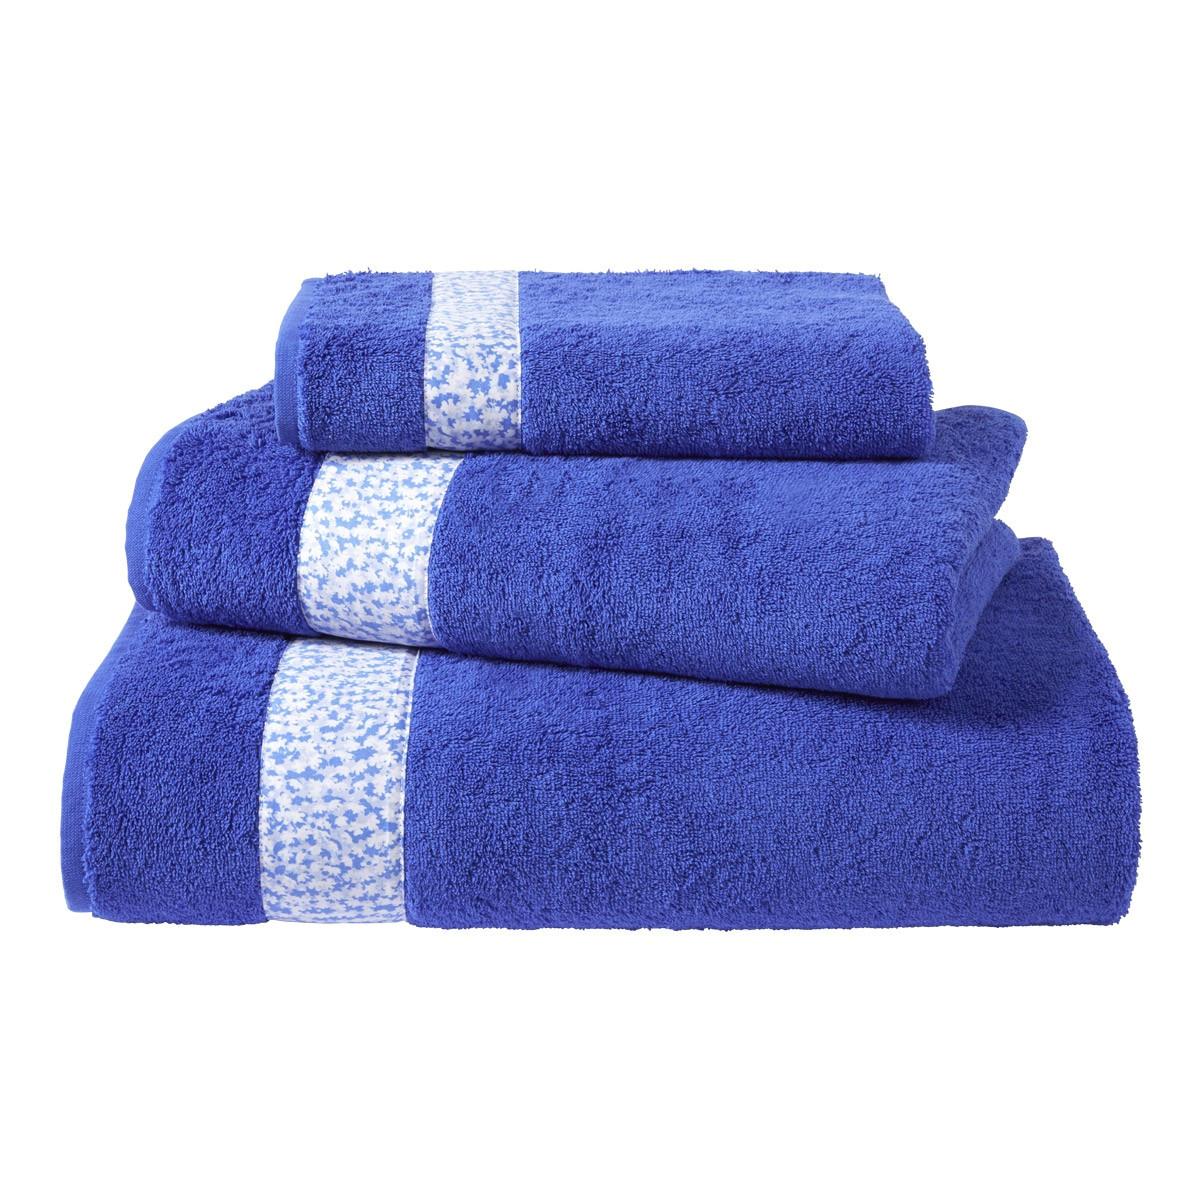 bath sheet vs bath towel awesome belvedere towel bath towels bath linen olivier desforges of bath